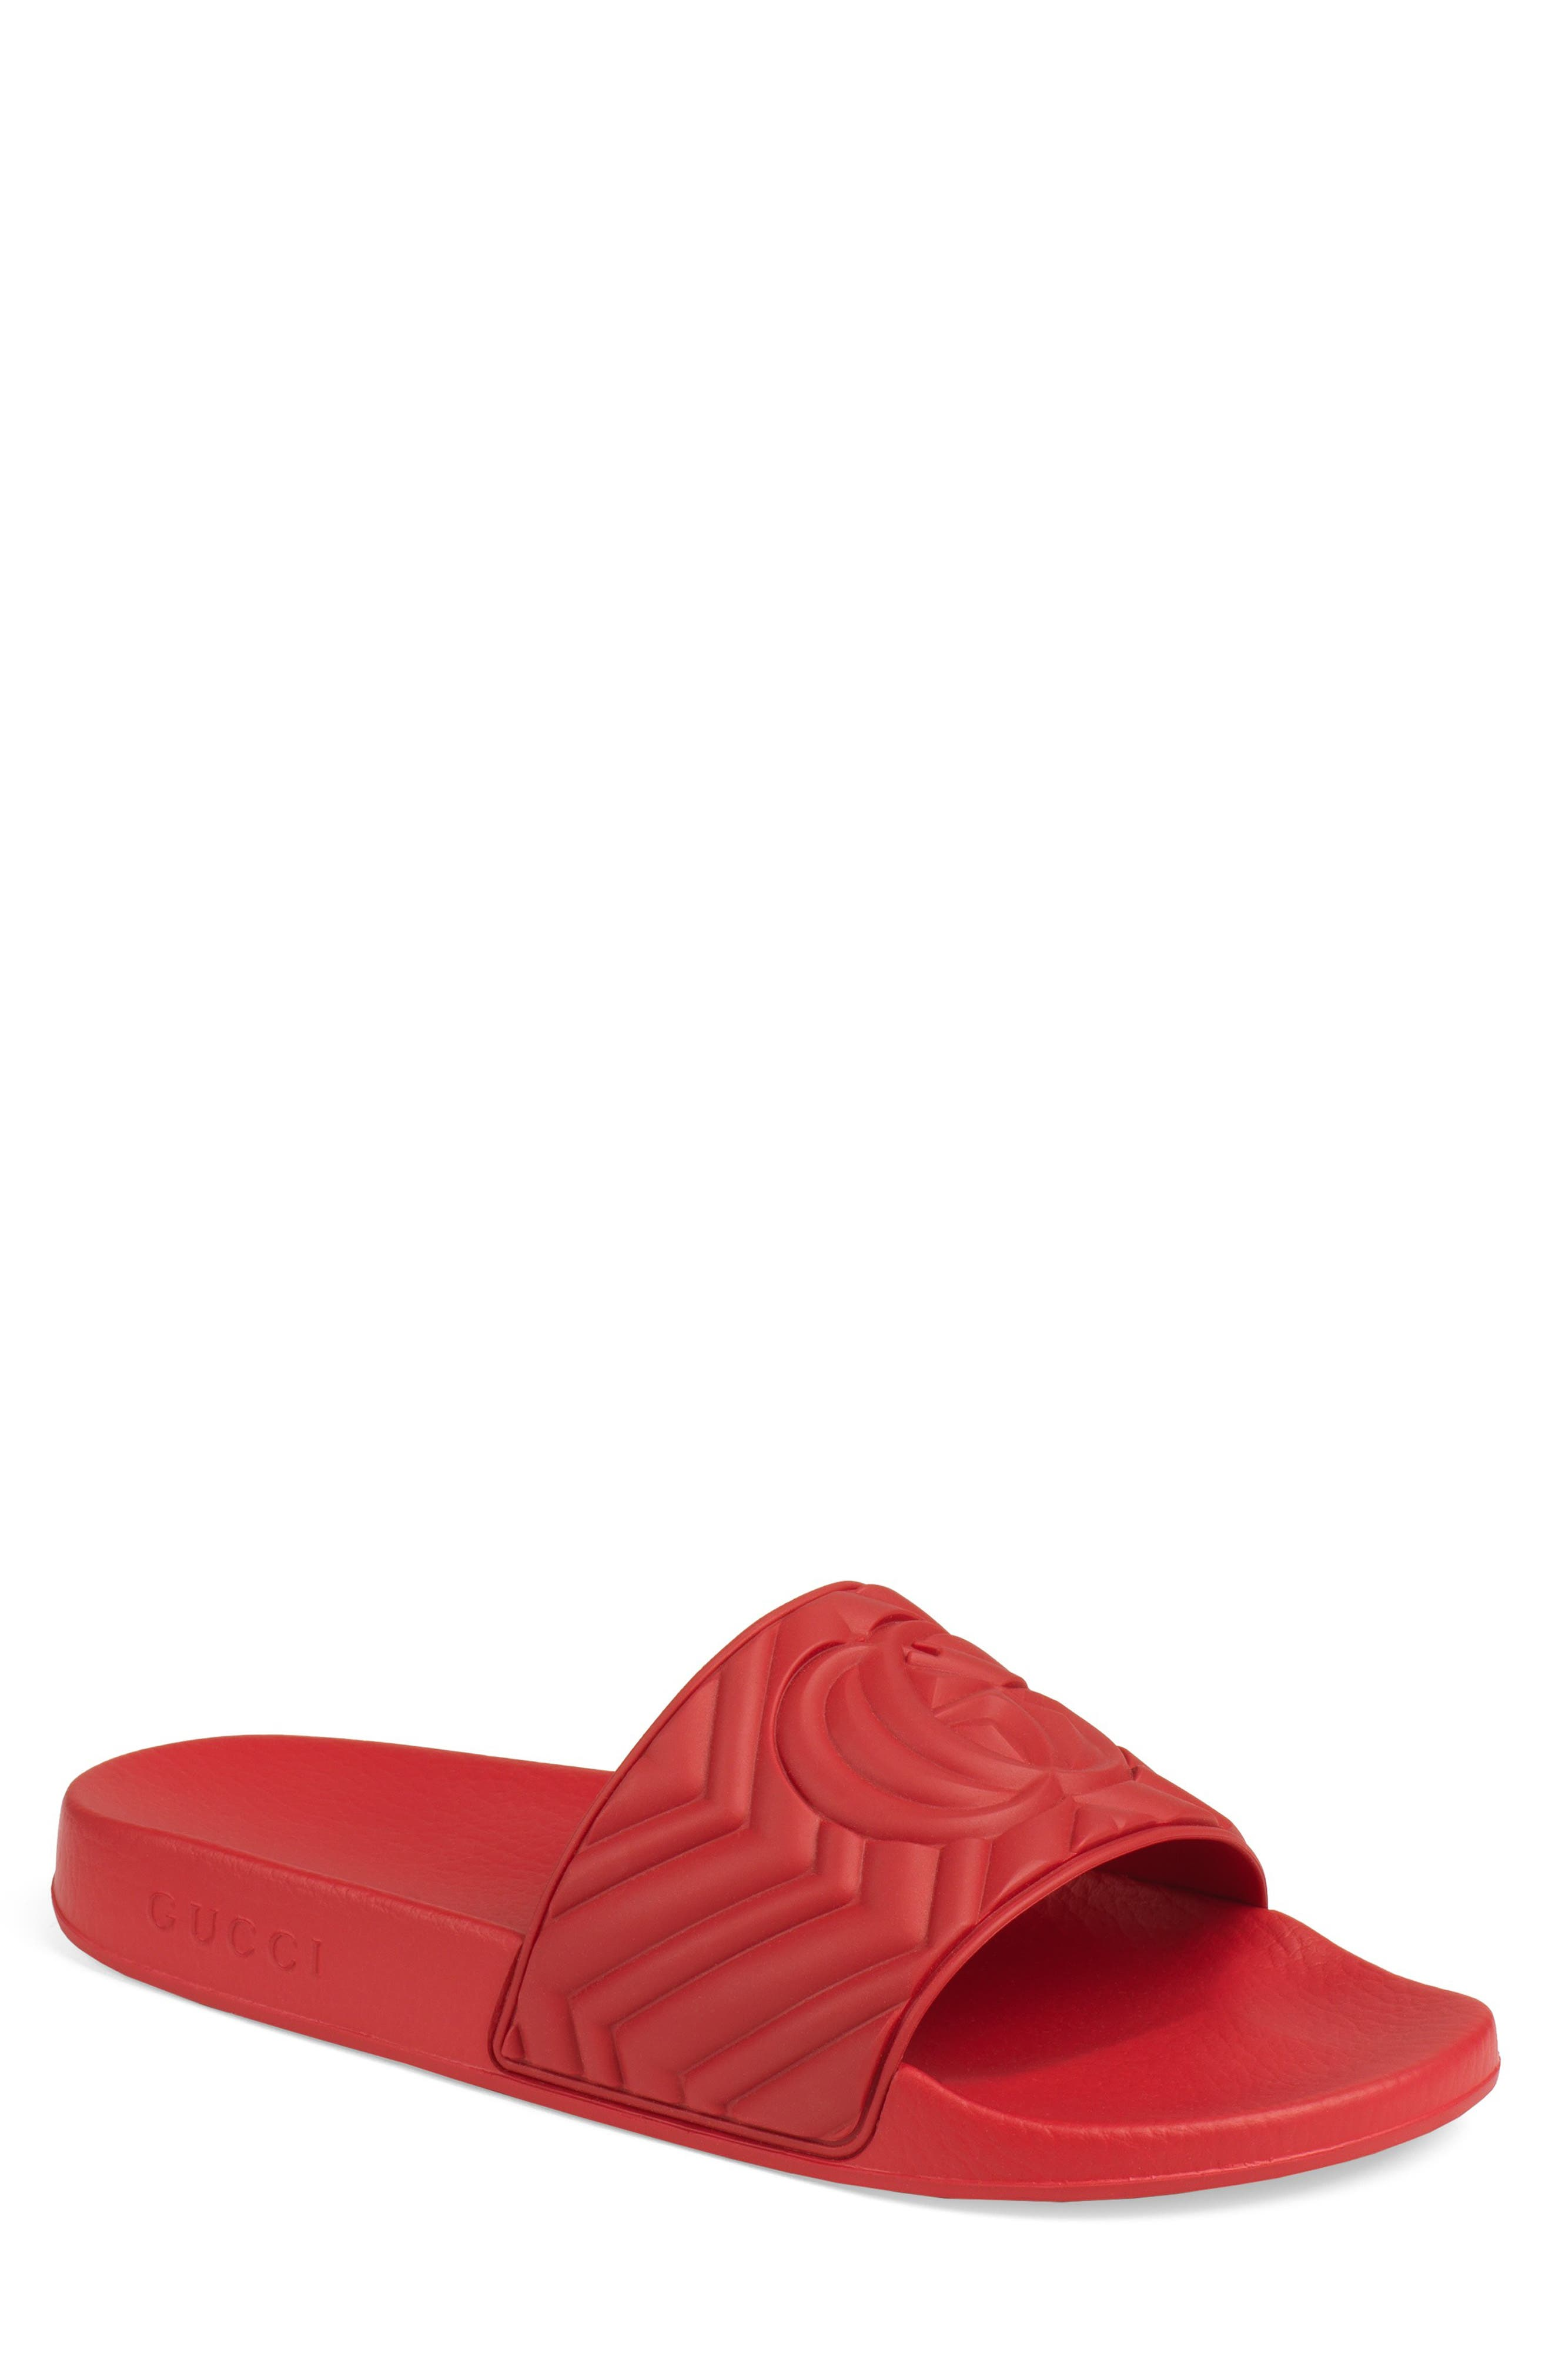 Men's Red Shoes | Nordstrom